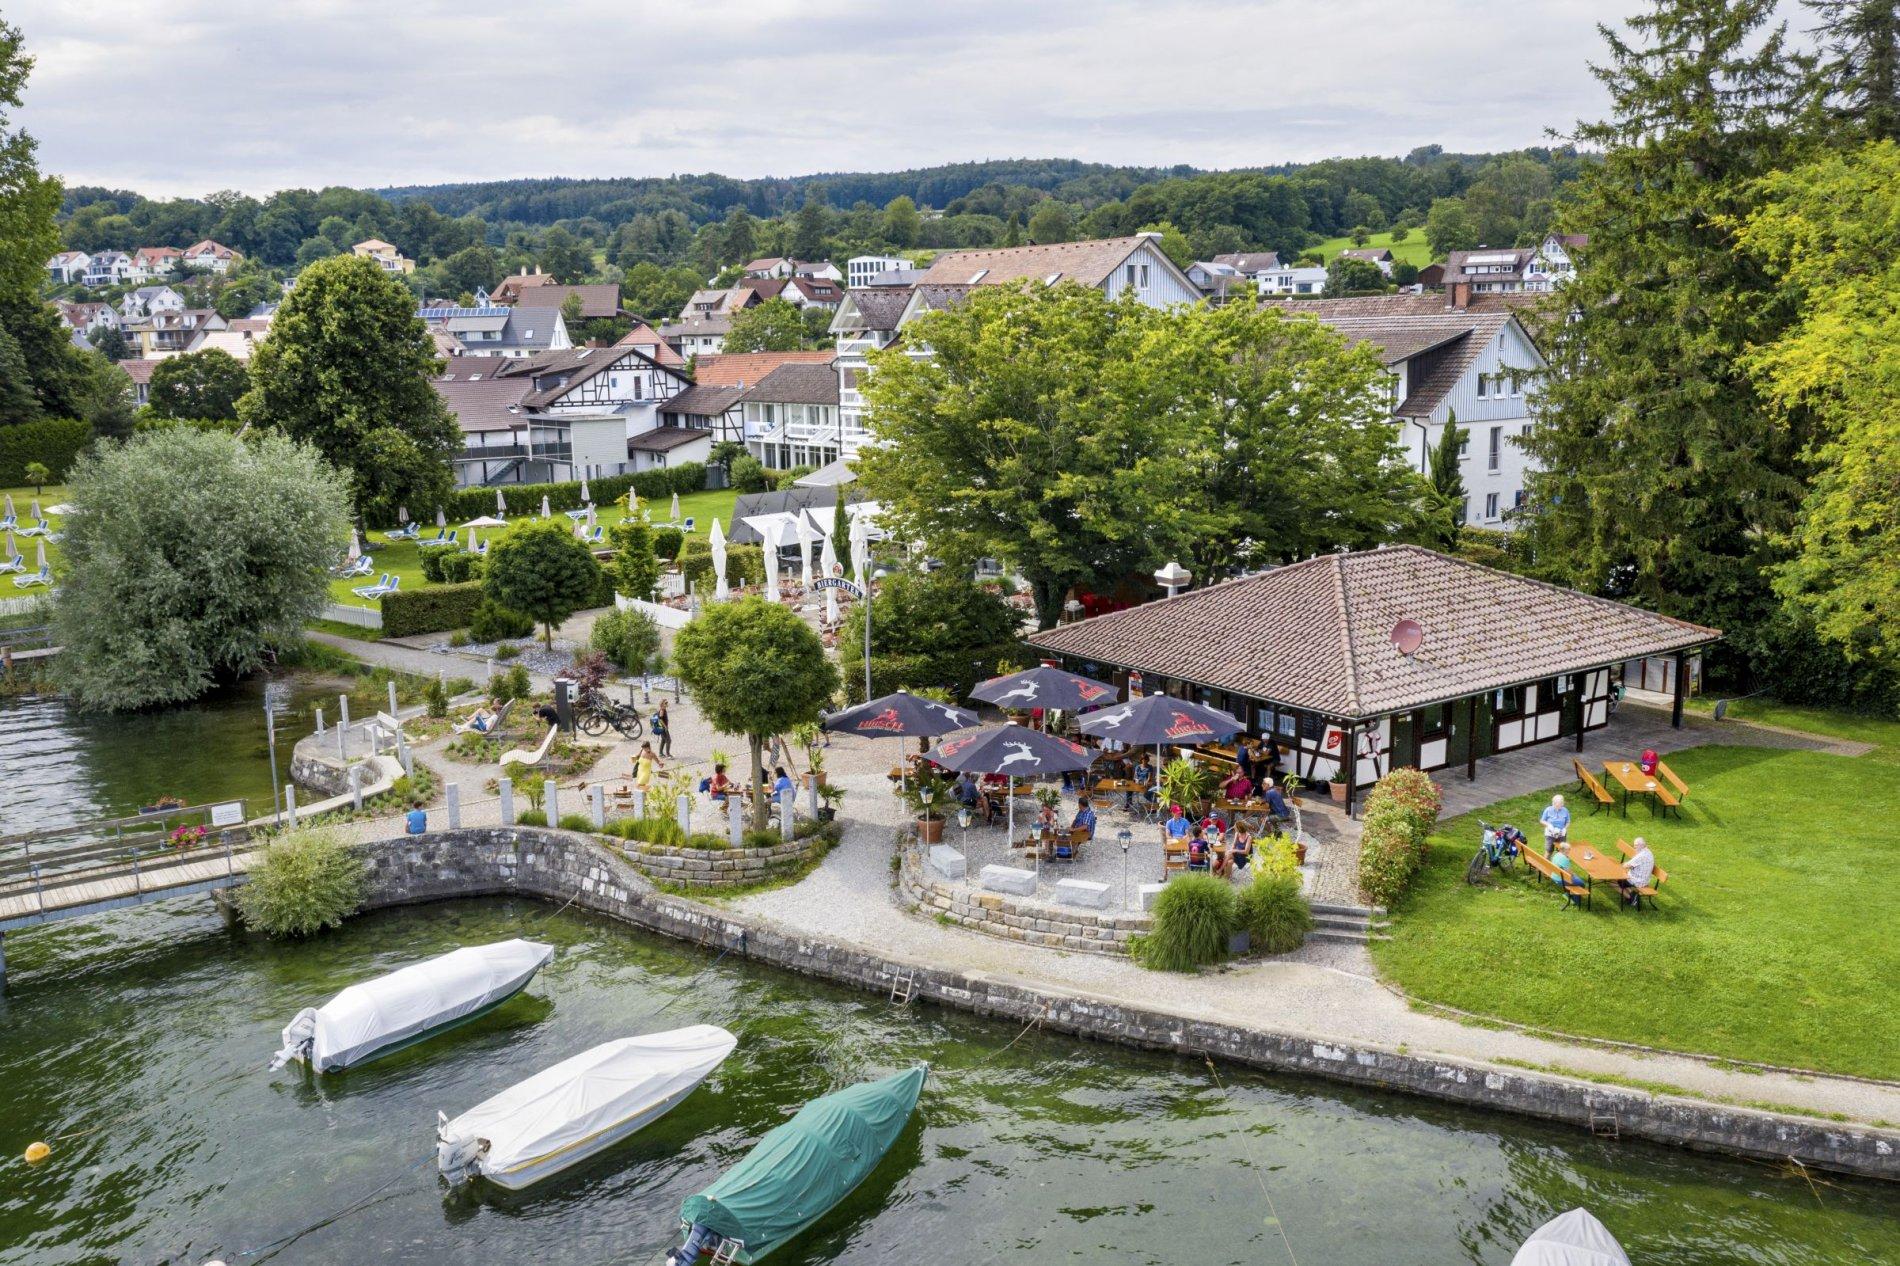 Biergarten Ufer 24